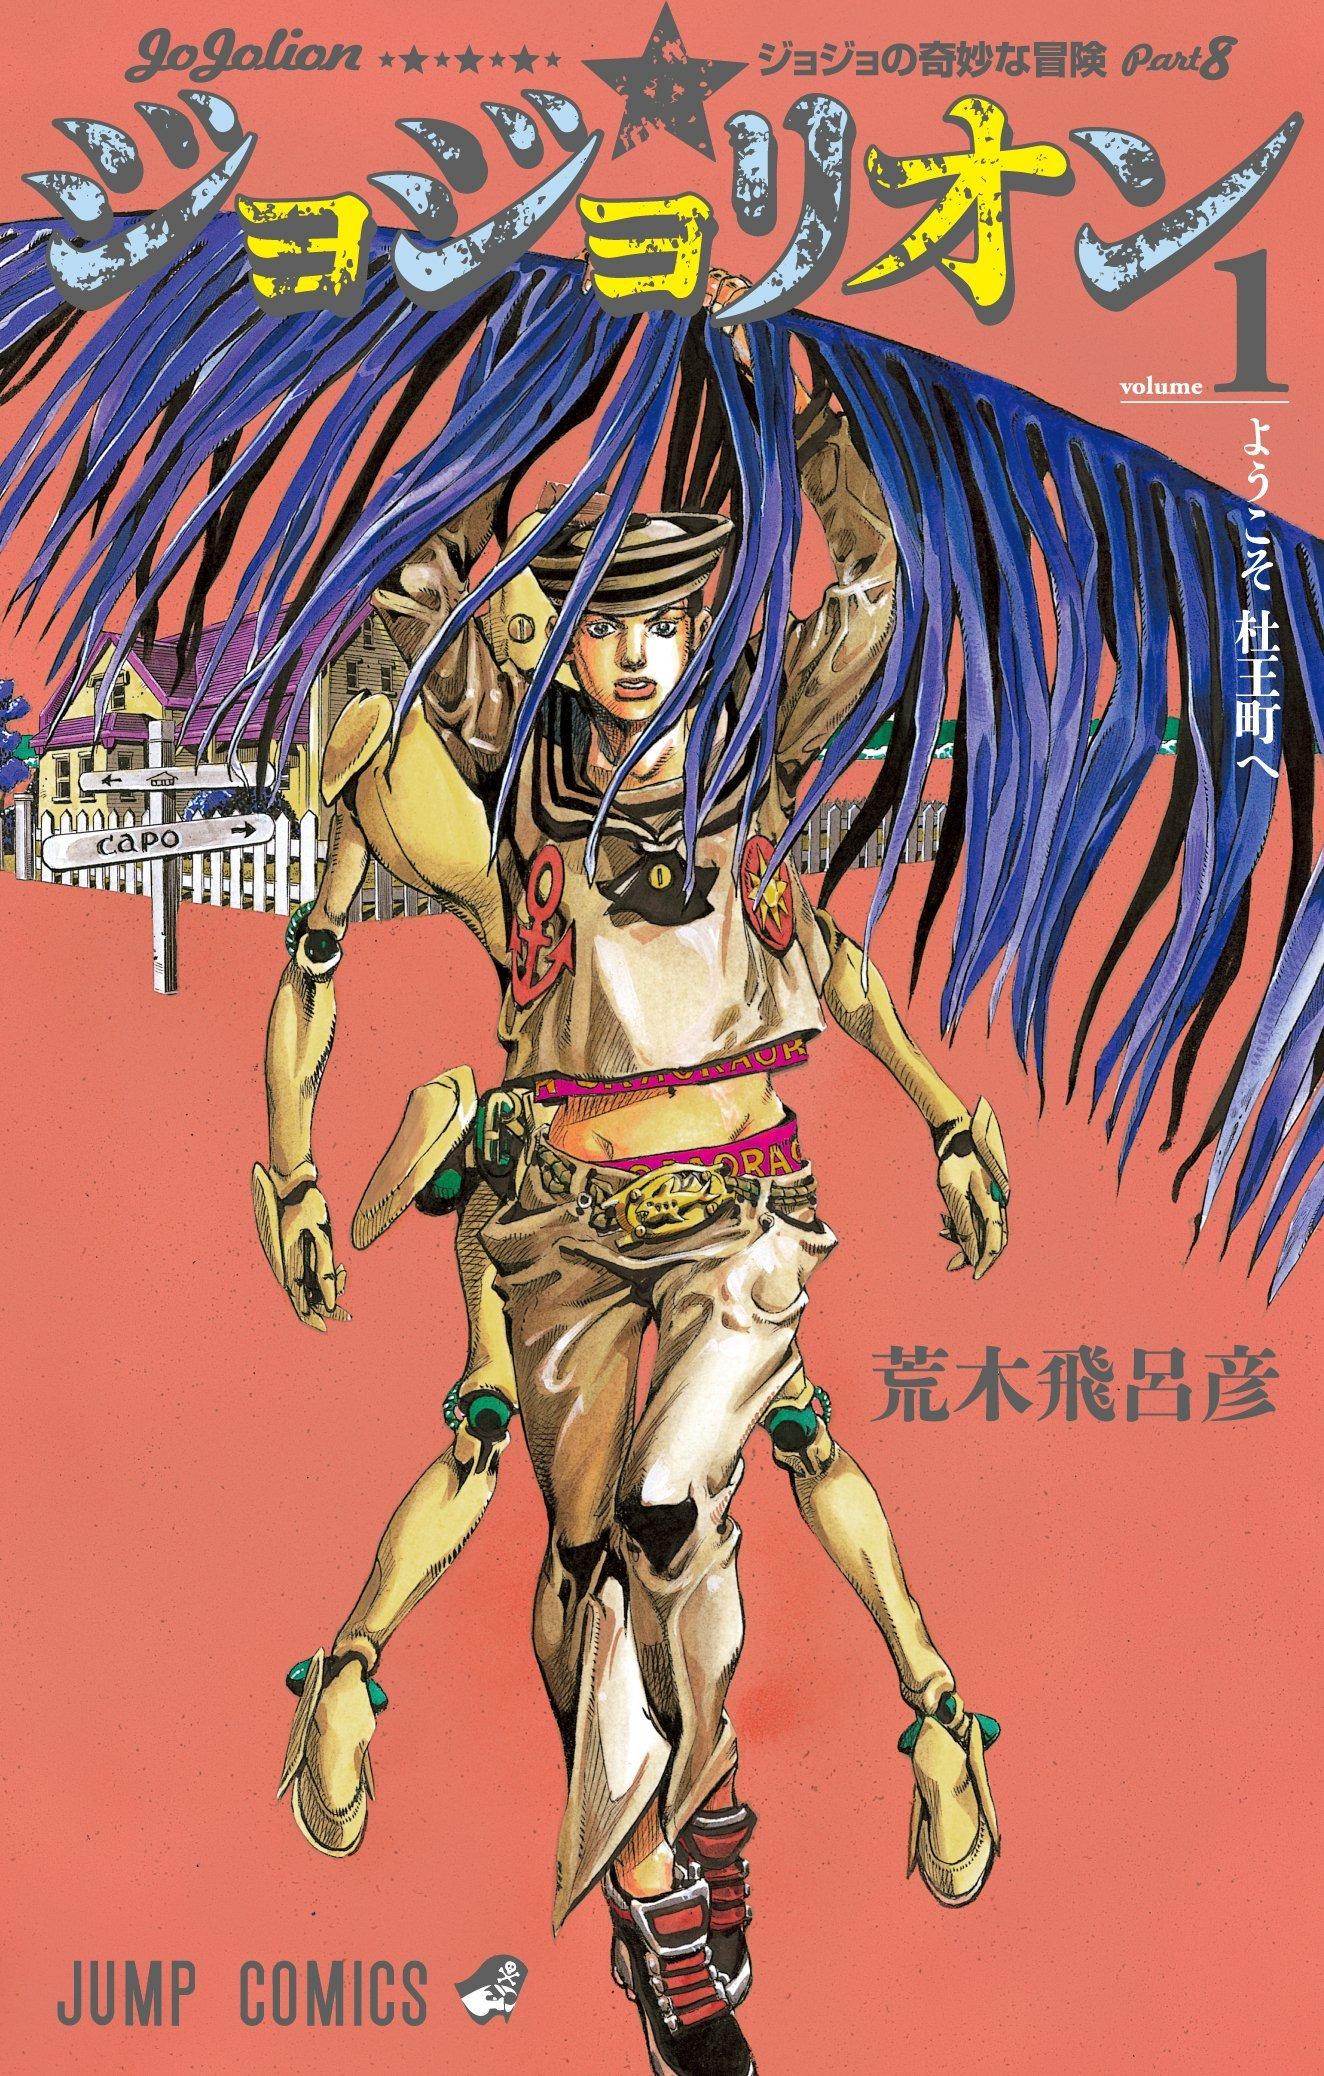 jojo-s-bizarre-adventure-jojolion-manga-volume-1-japonaise-53741